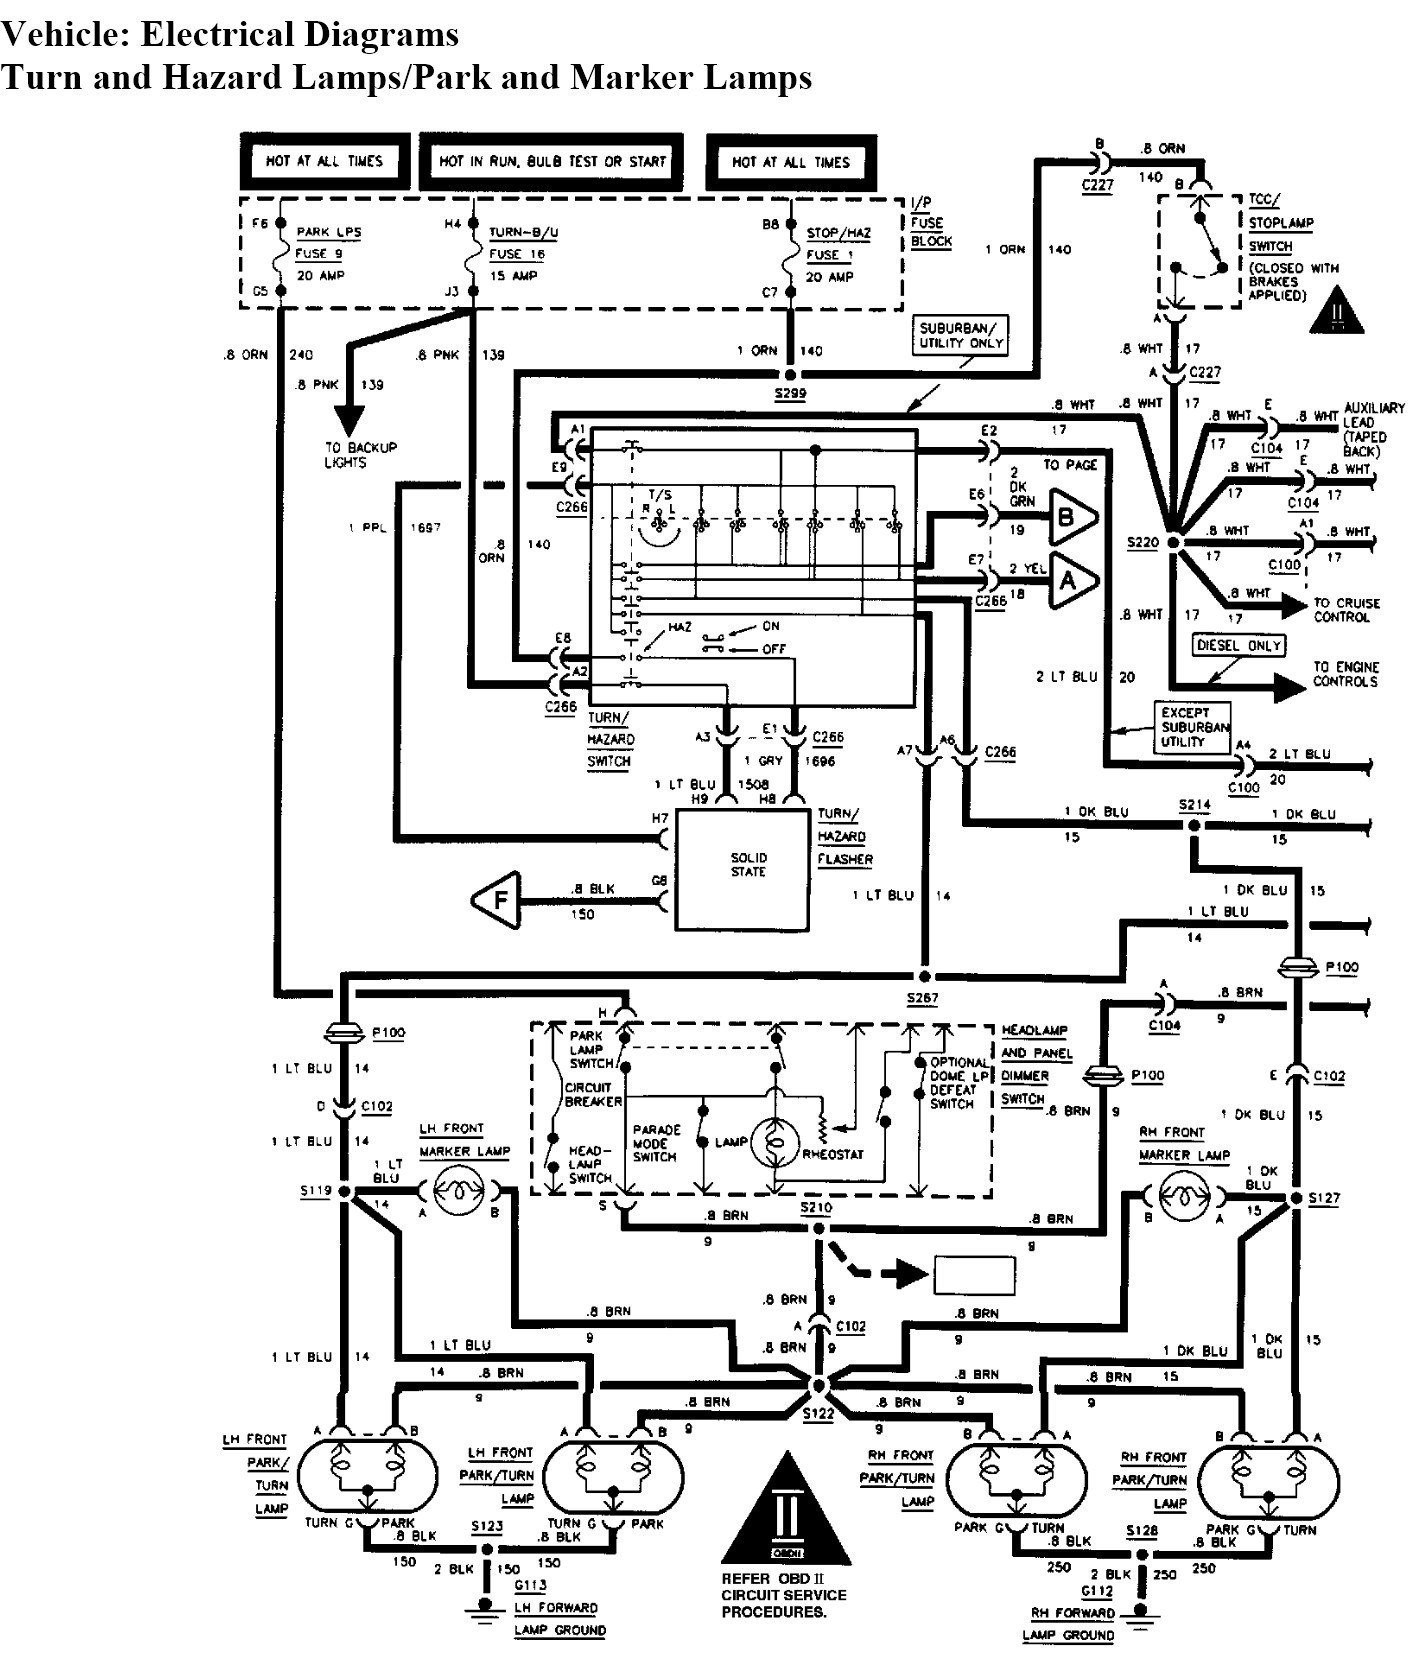 1994 gmc sierra brake lights wiring diagram fixya